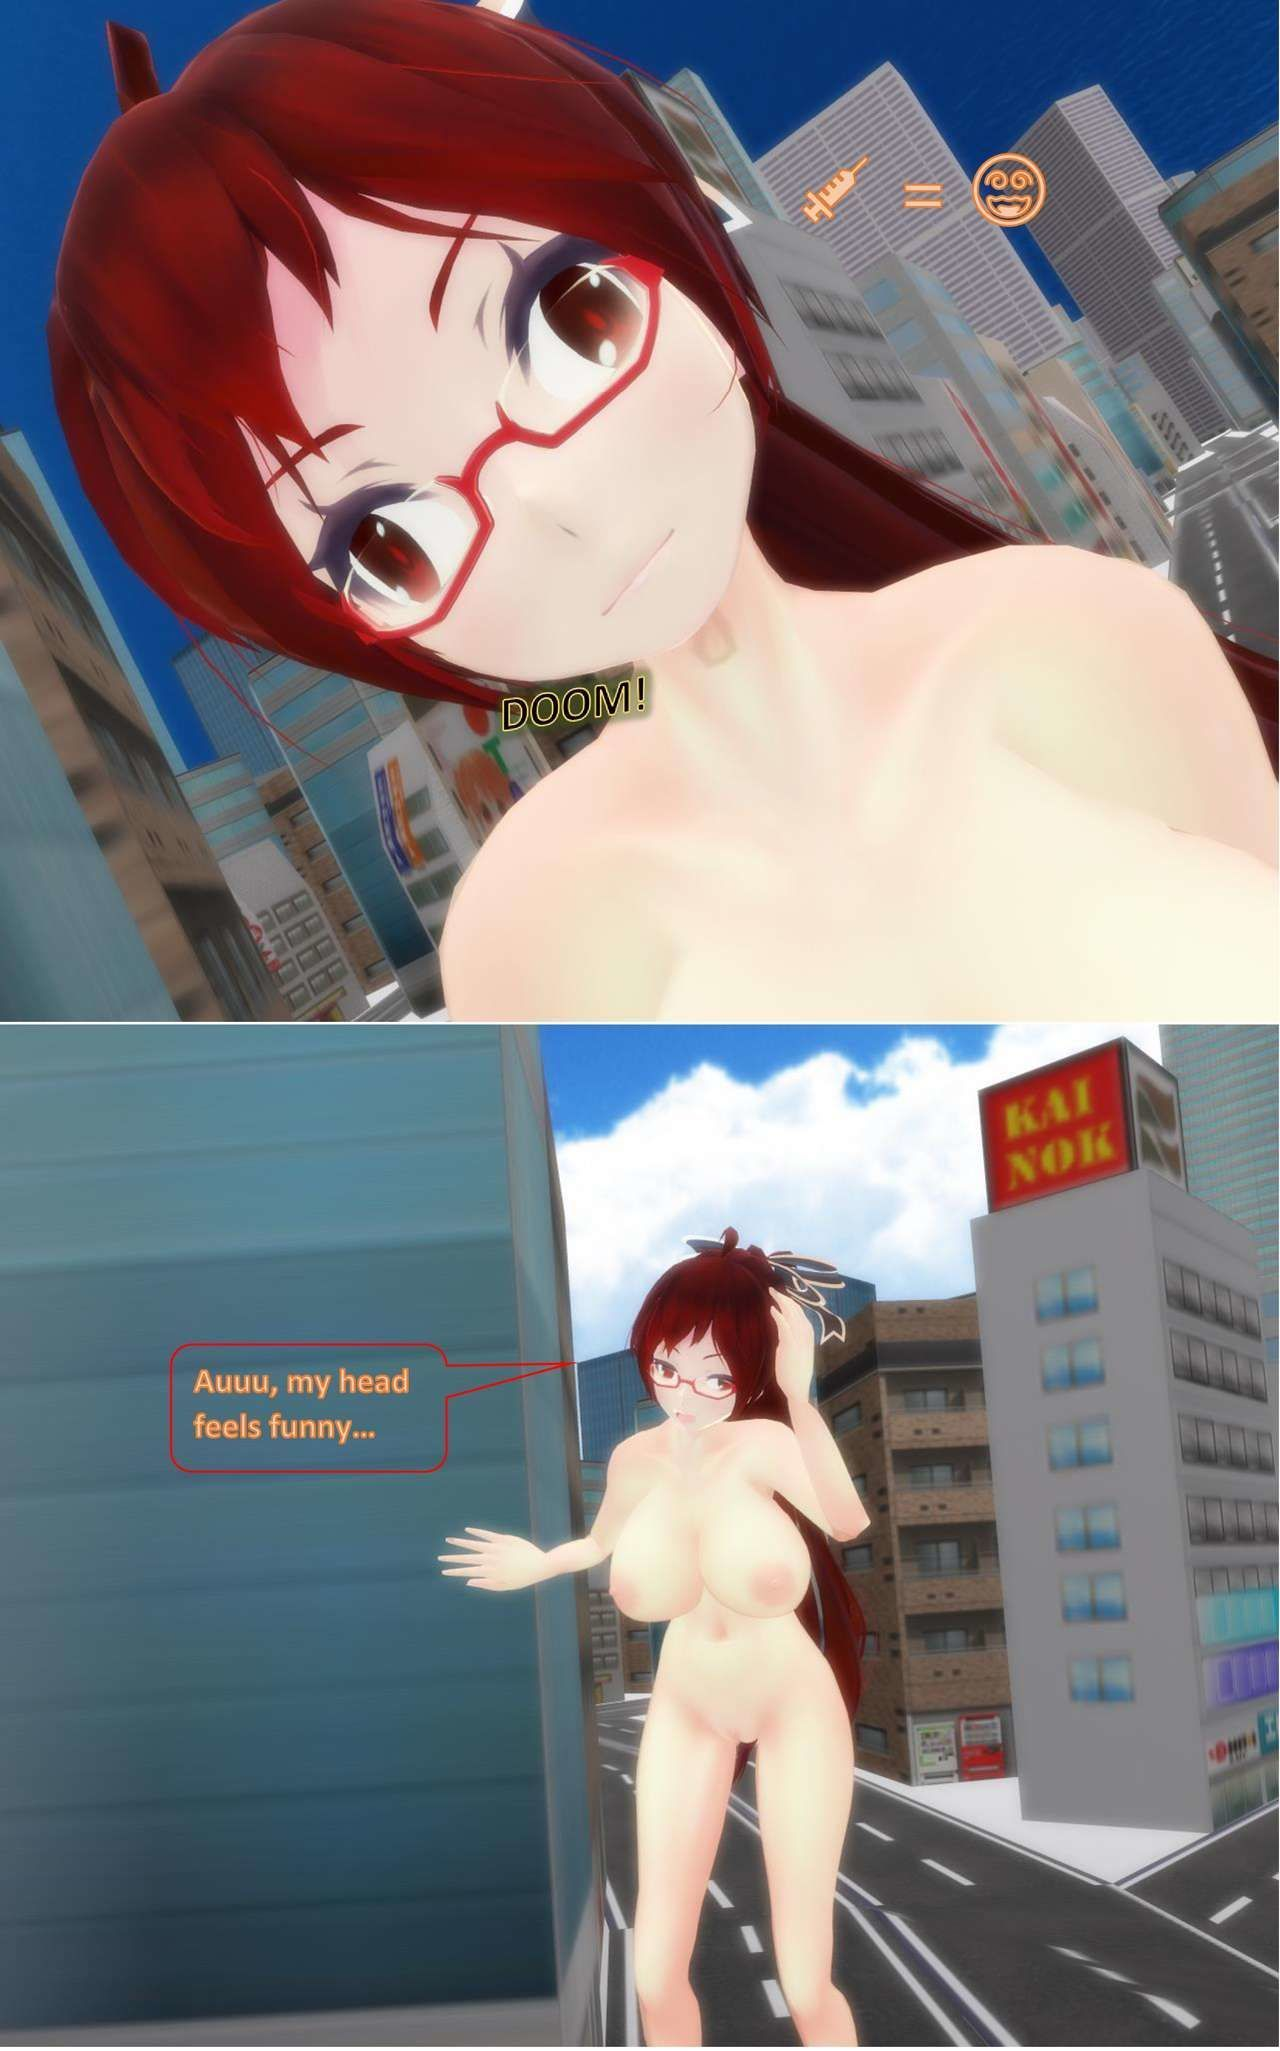 [Fumika] Saya´s Adventure - part 5